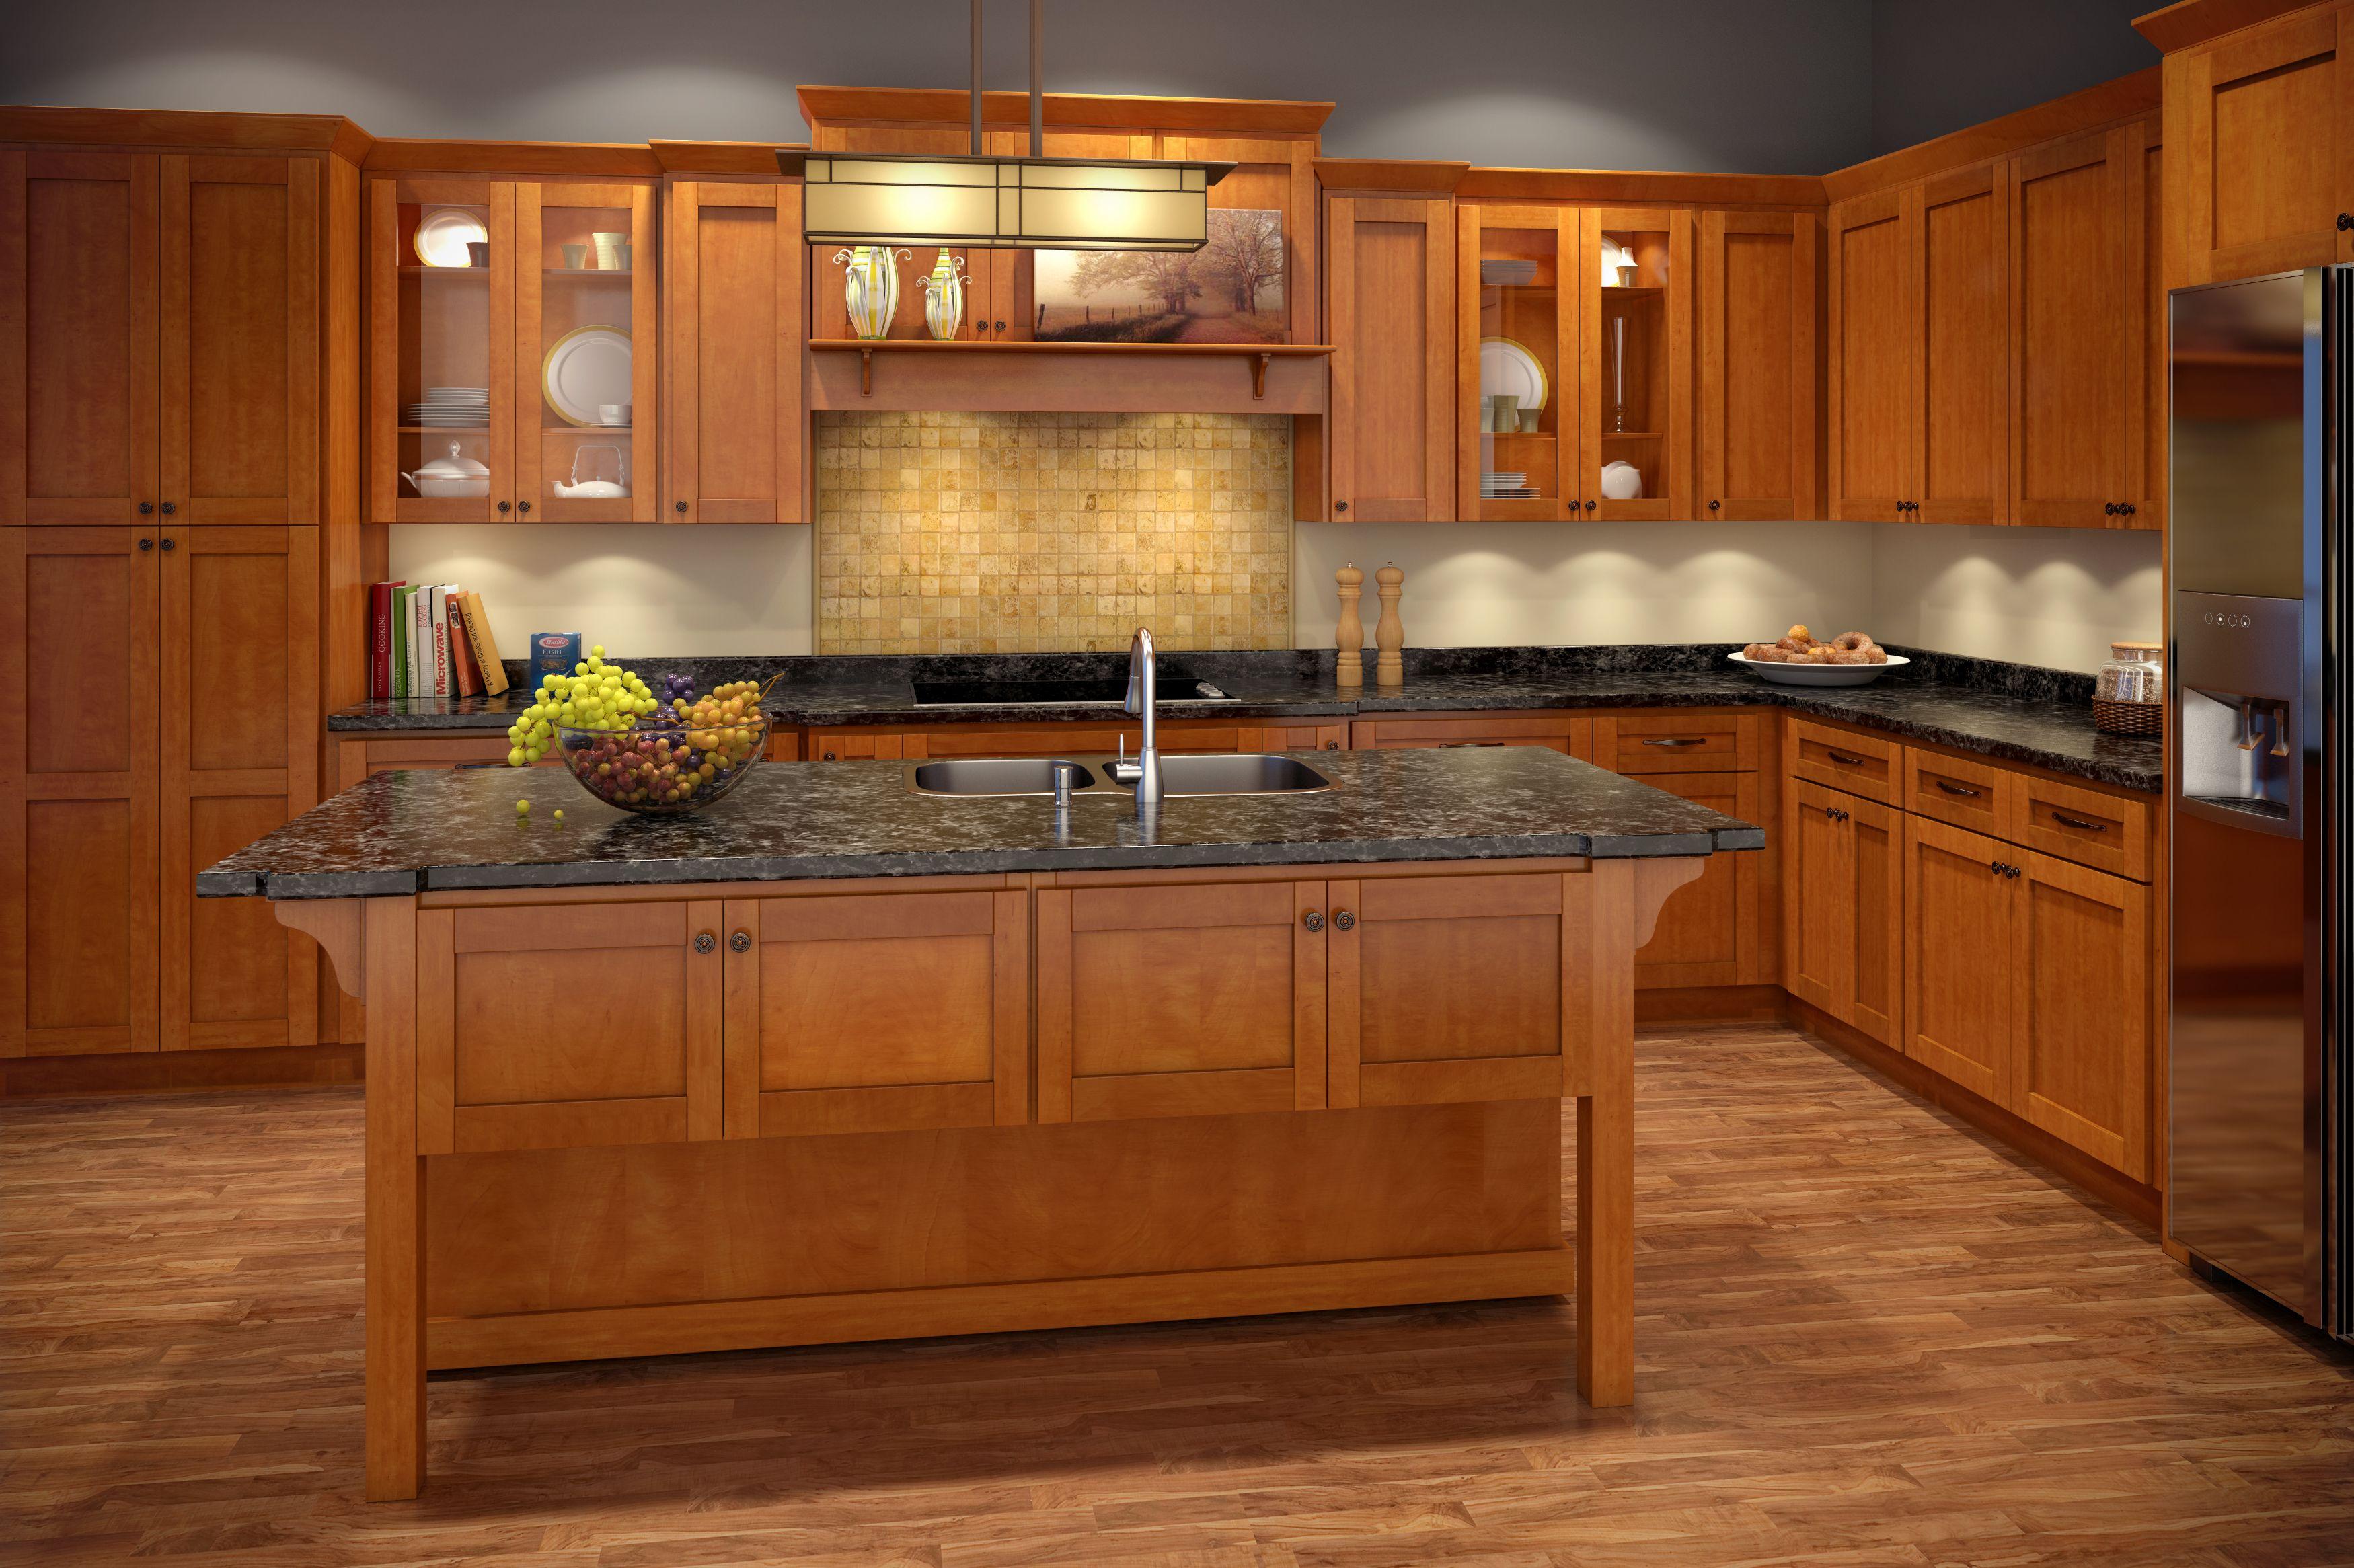 Cinnamon Shaker Assembled Cabinets Style Kitchen Cabinet Design